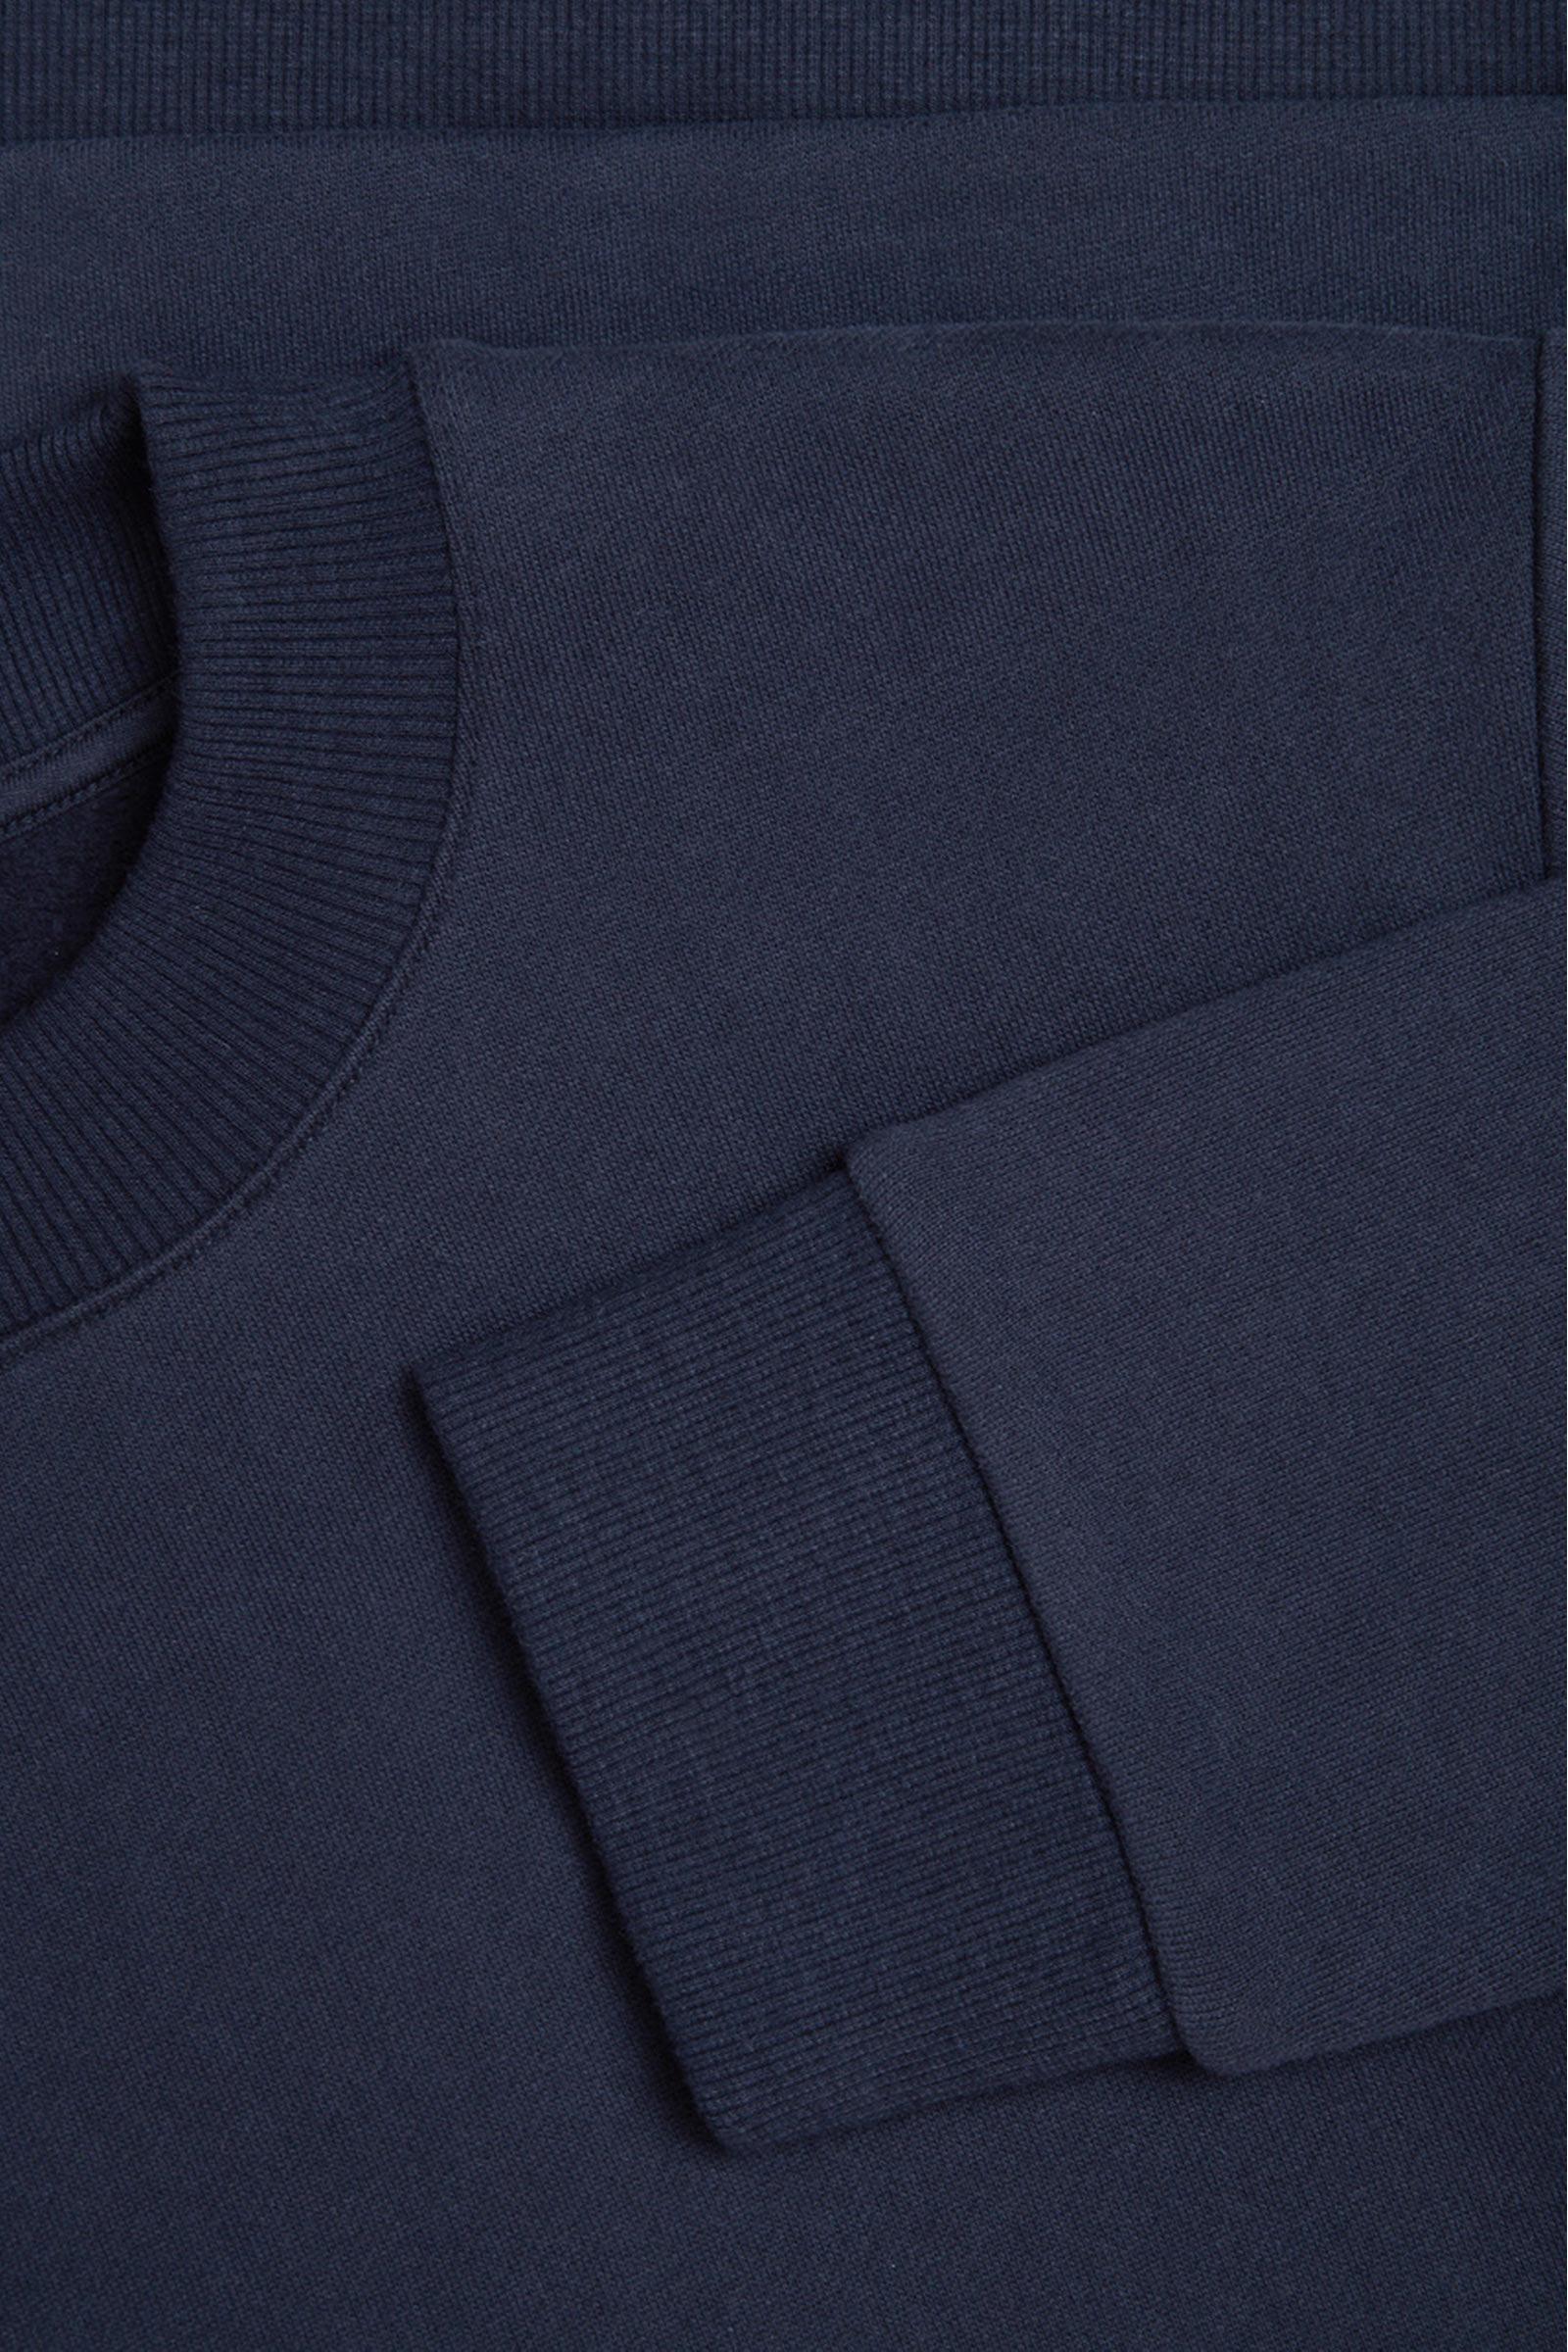 COS 코튼 스웻셔츠의 블루컬러 Detail입니다.